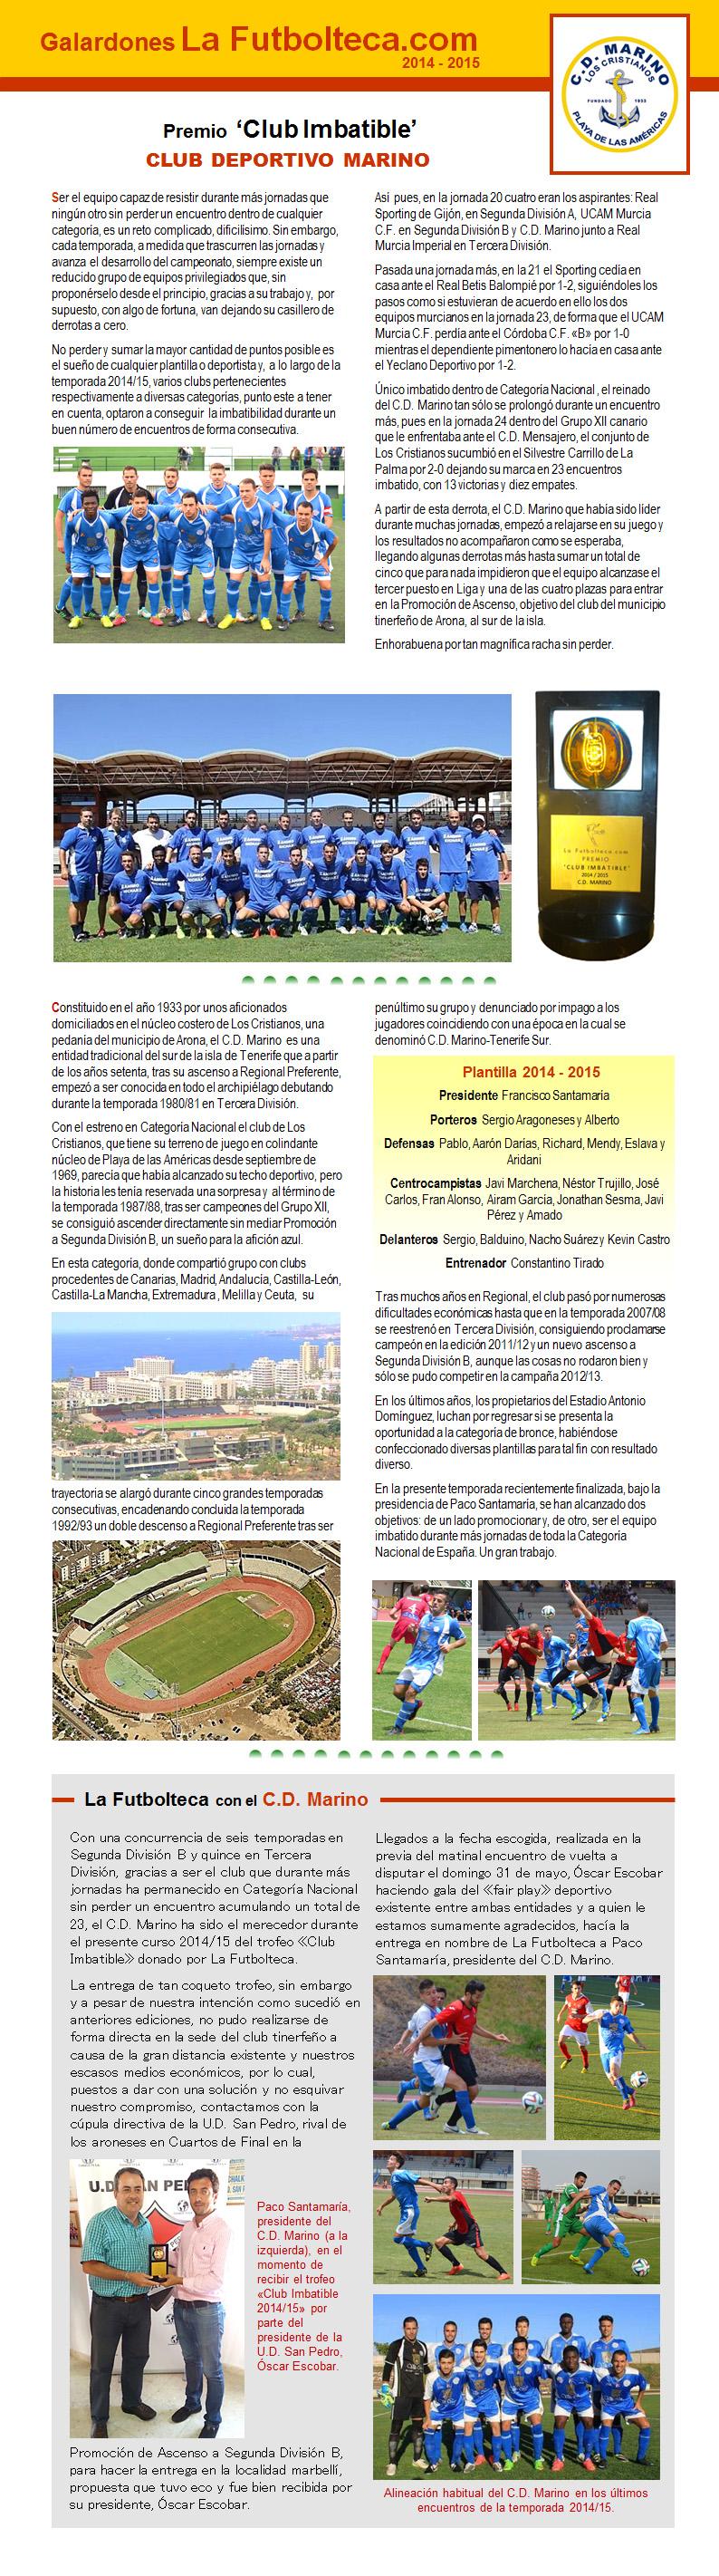 Premio Club Imbatible La Futbolteca 2015